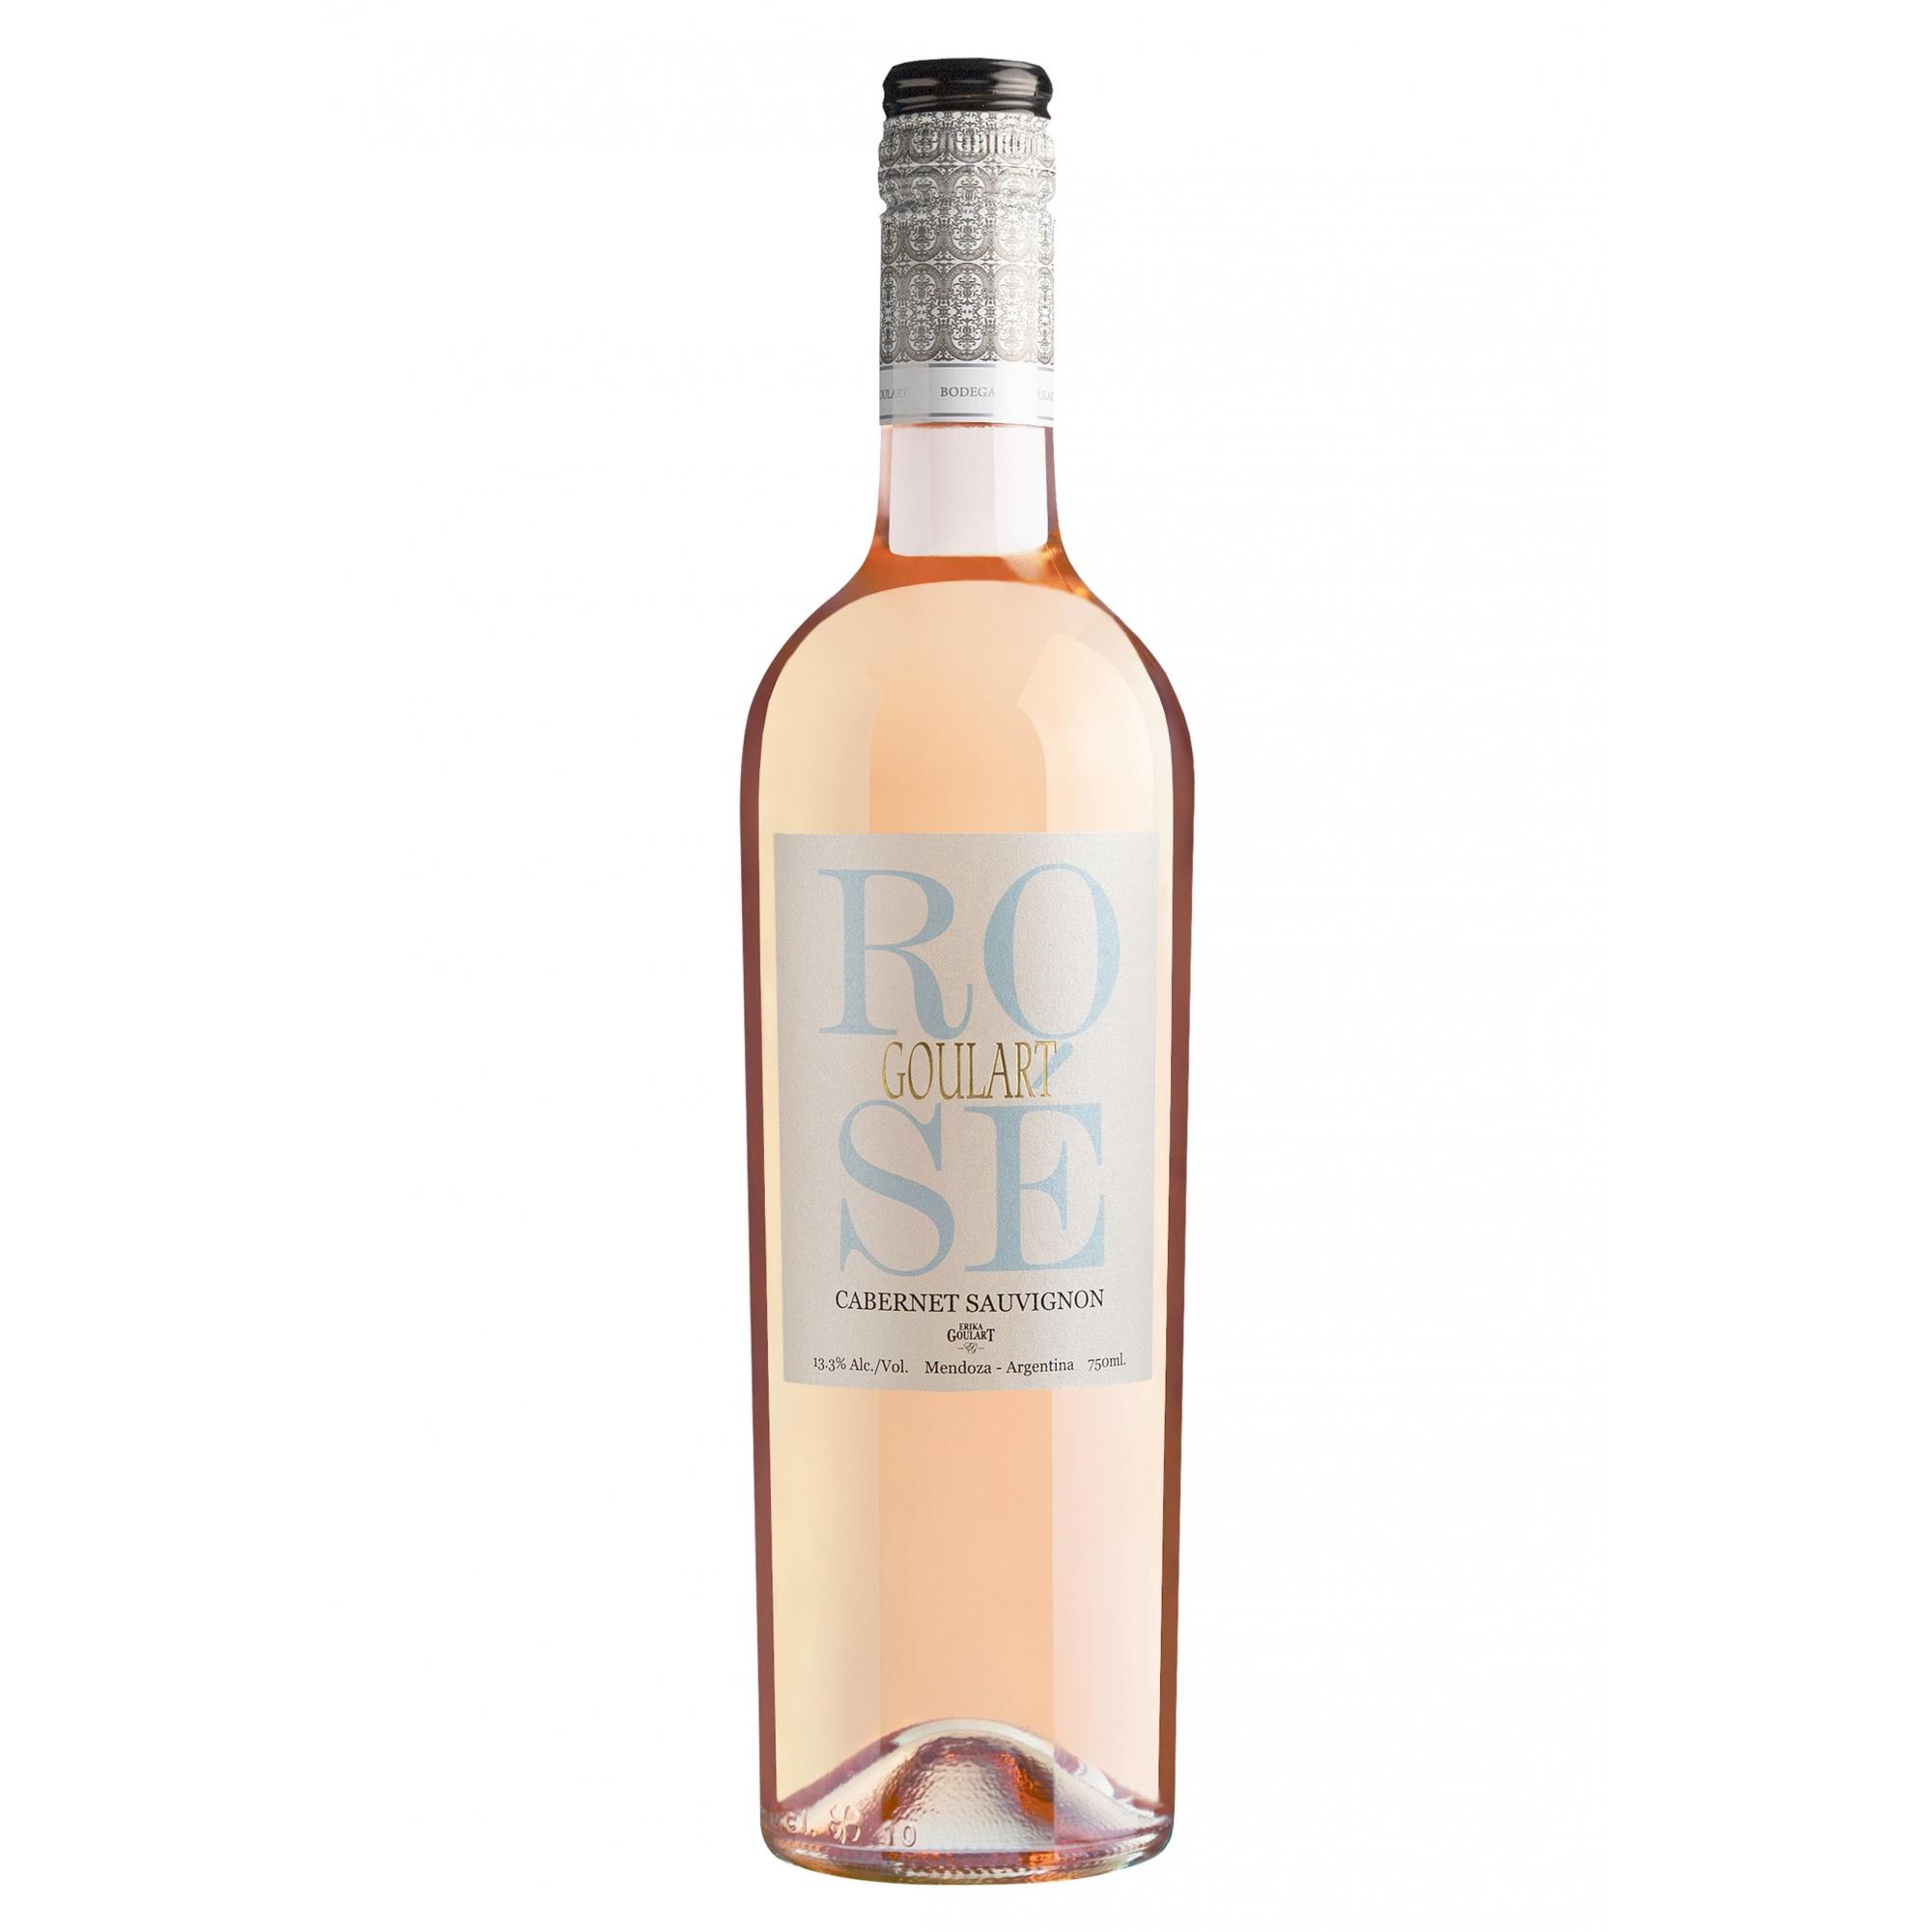 Goulart Rosé Cabernet Sauvignon 2019 - 750ml